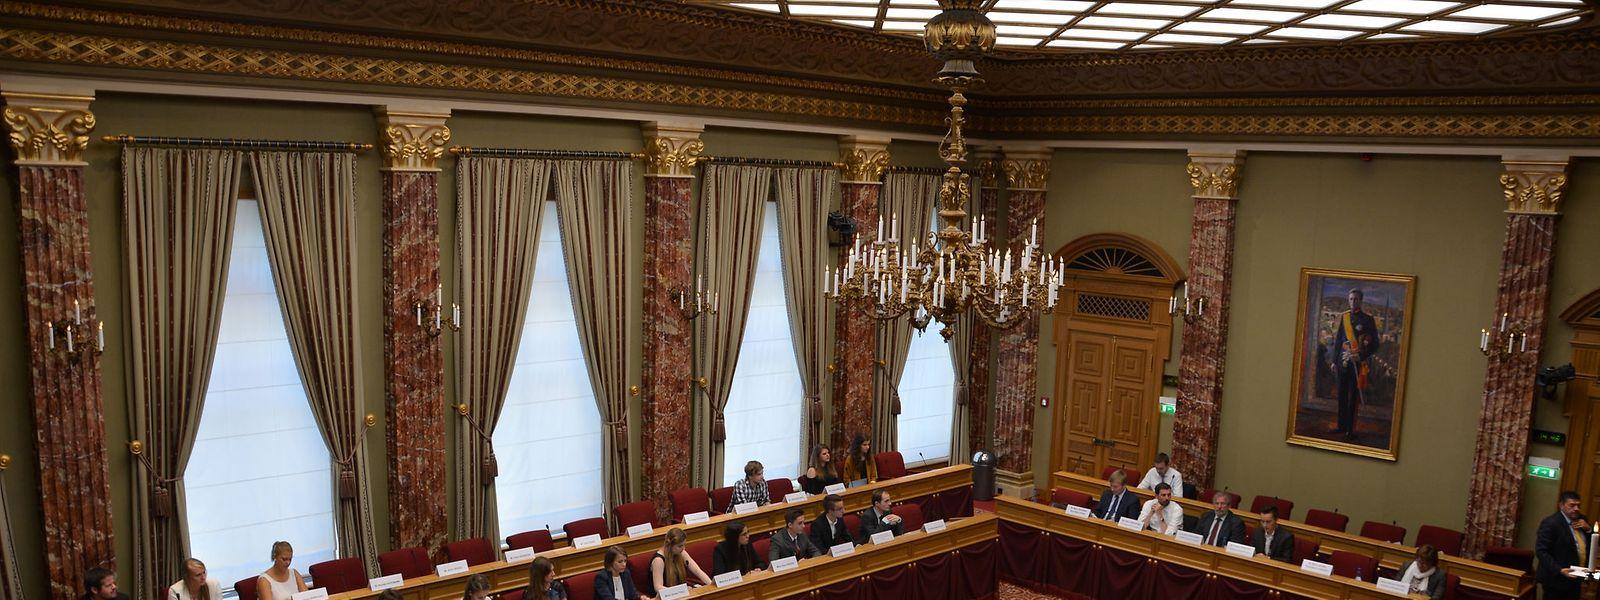 Jugendparlamentarier beim Empfang in der Abgeordnetenkammer am 10. Juli 2015.